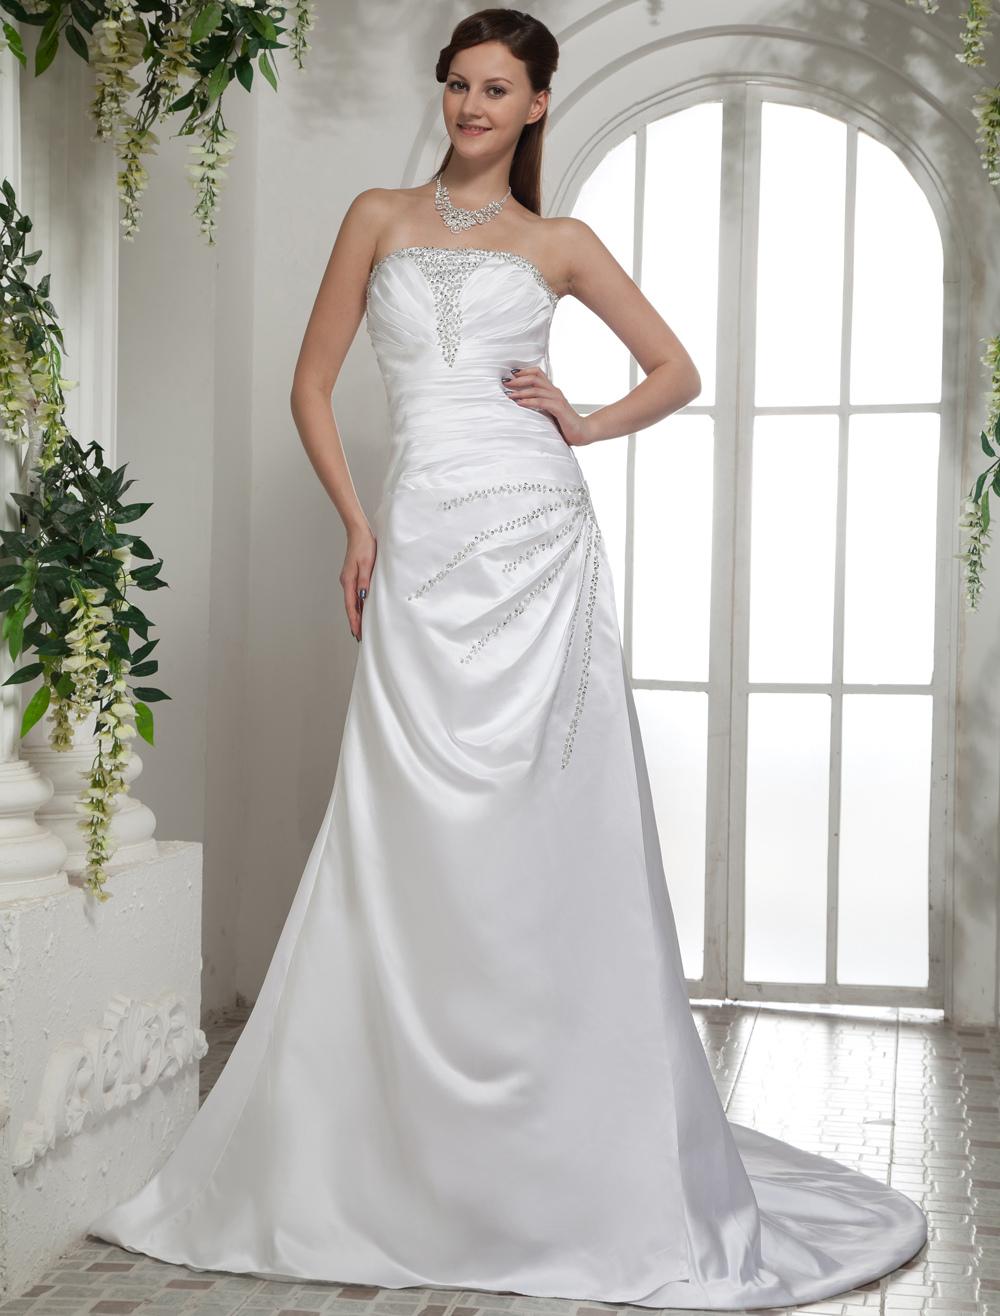 White Satin Beading A-line Sleeveless Bride's Wedding Dress